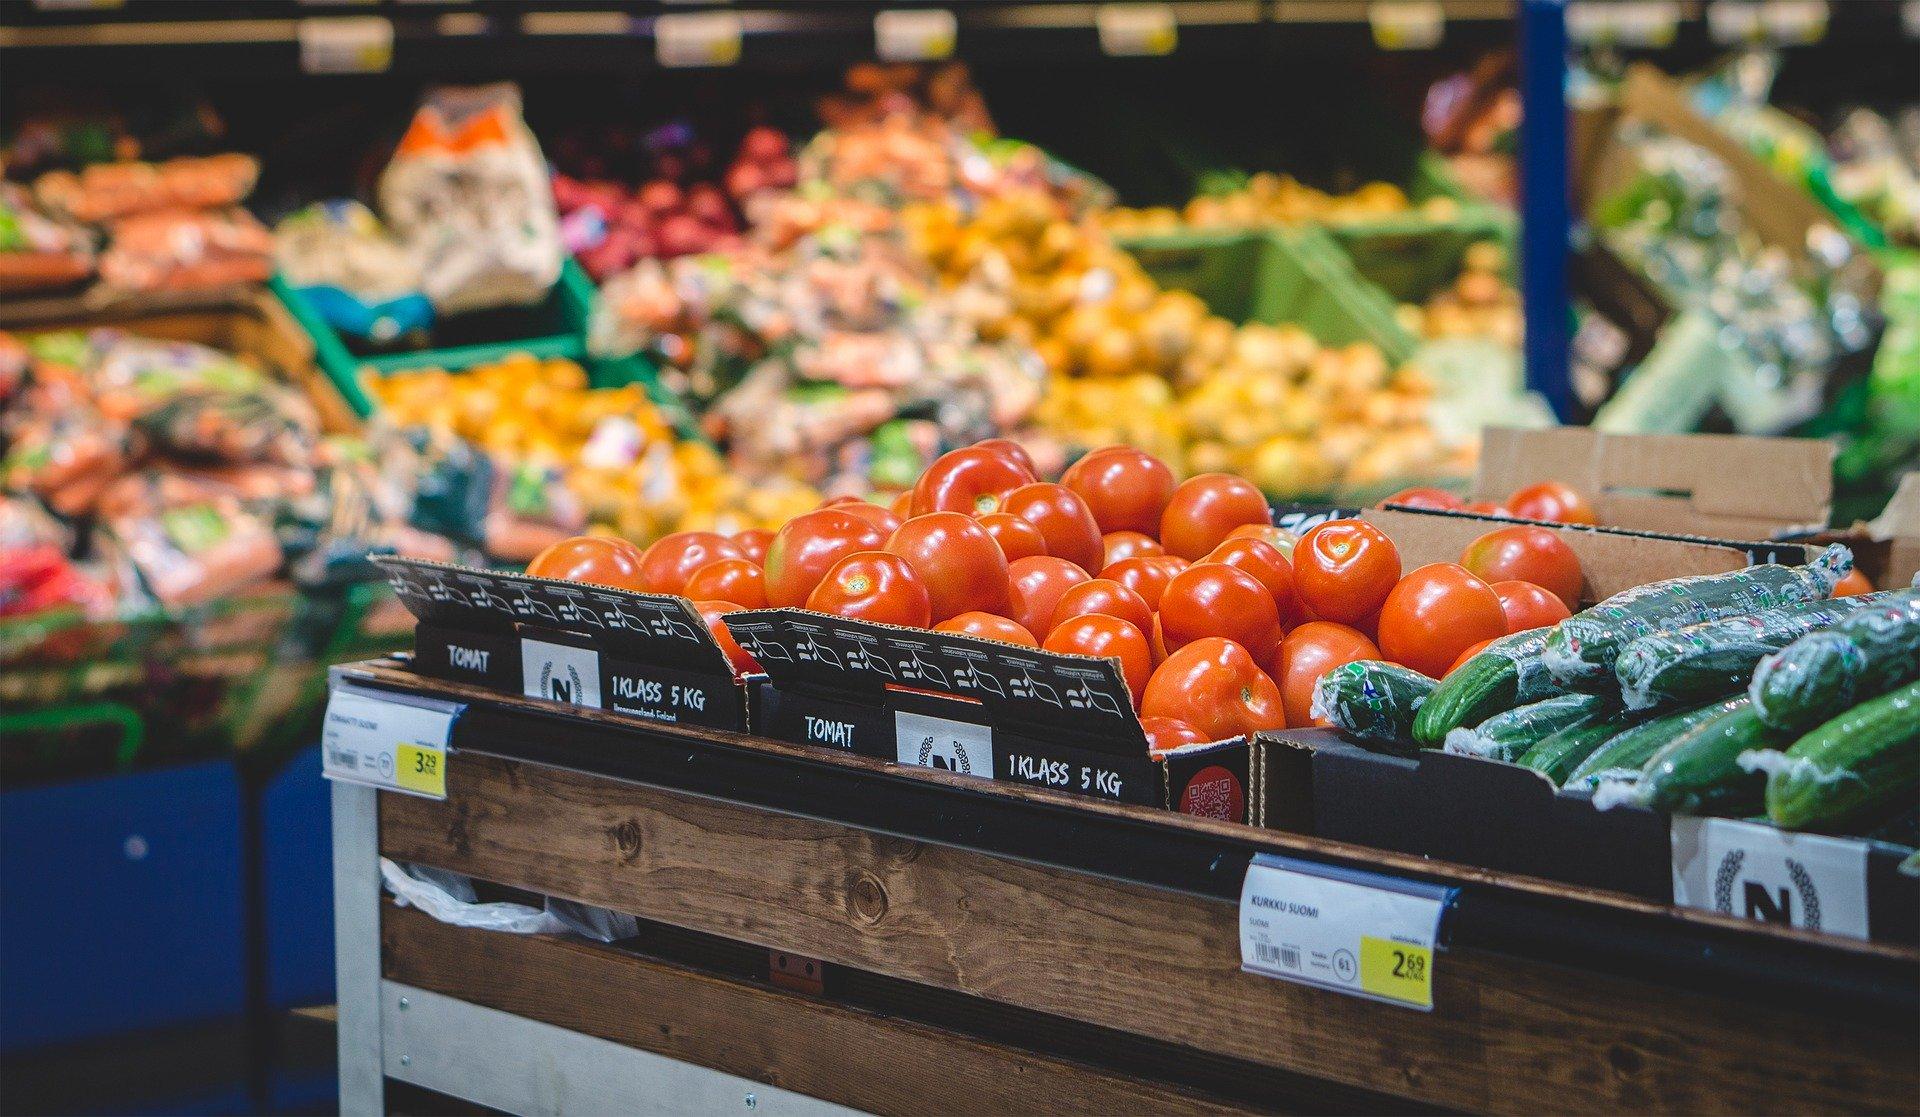 lebensmittel_supermarkt_grocery_obst_gemüse_nahrungsmittel_lebensmittelpreis_lebensmittelpreise